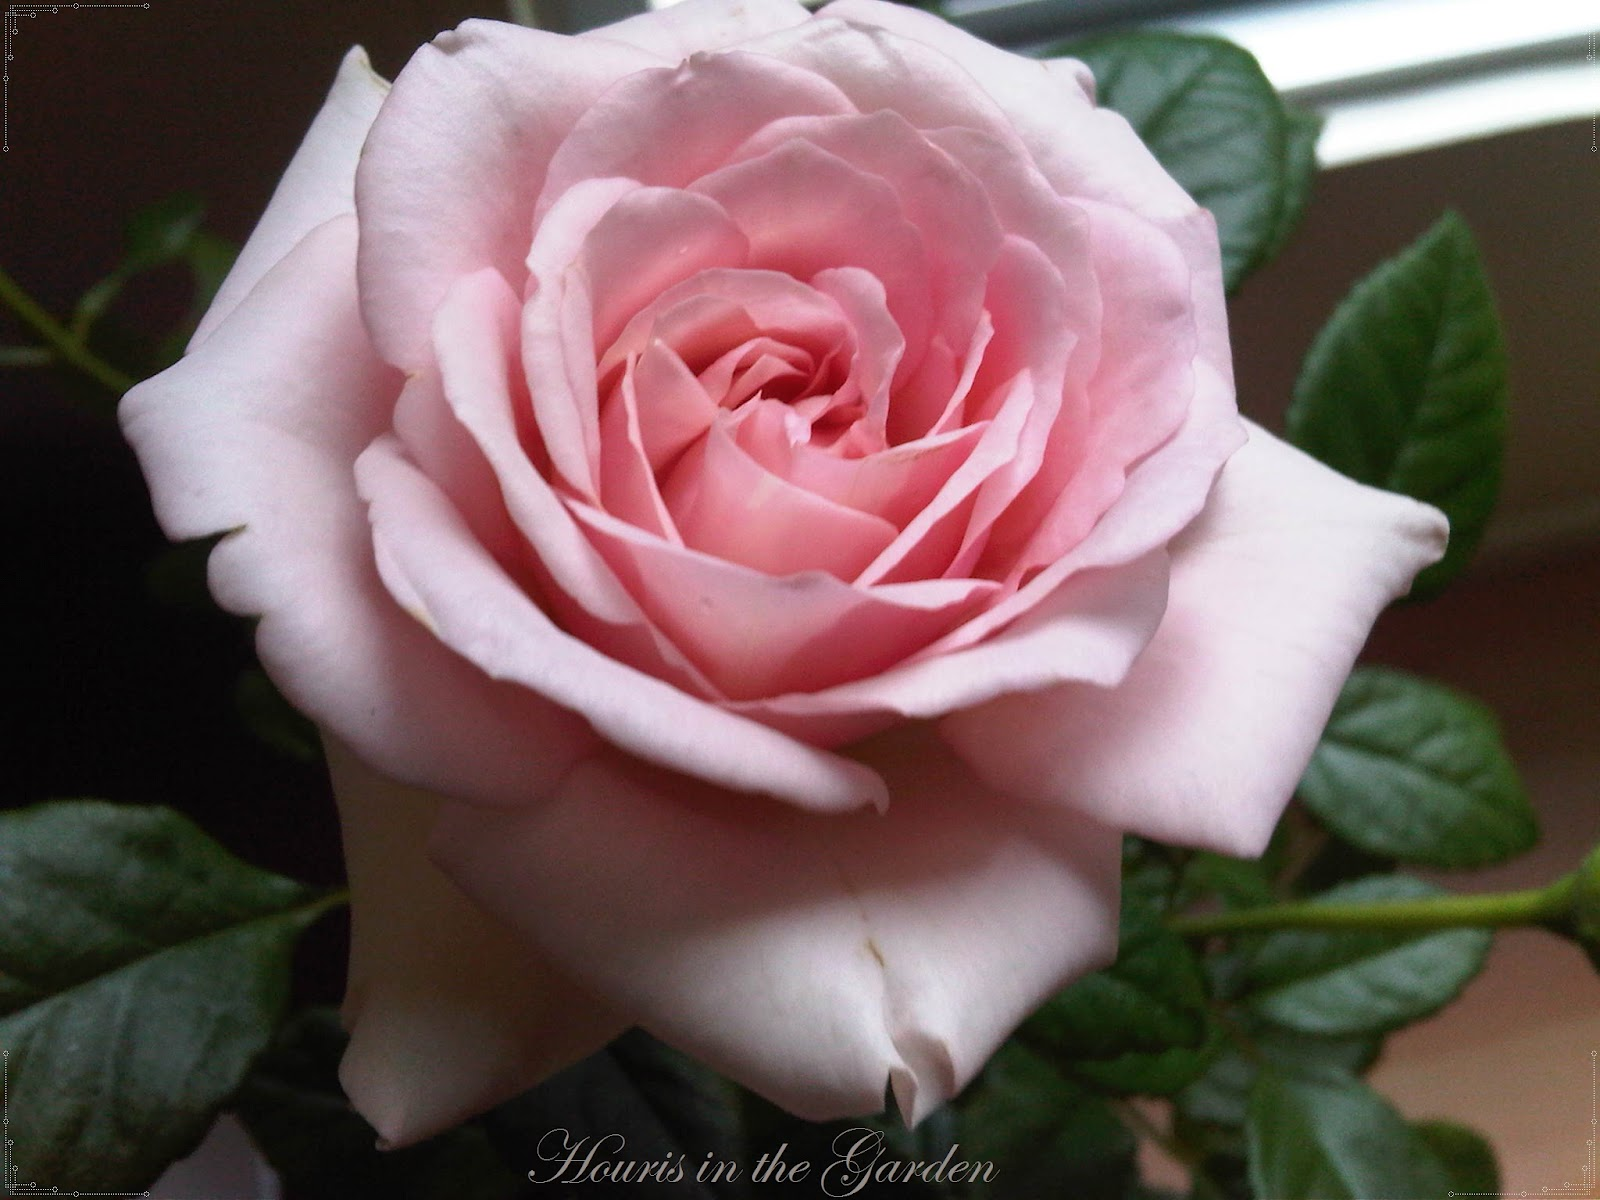 Houris in the Garden Enchanting Roseslight pink rose